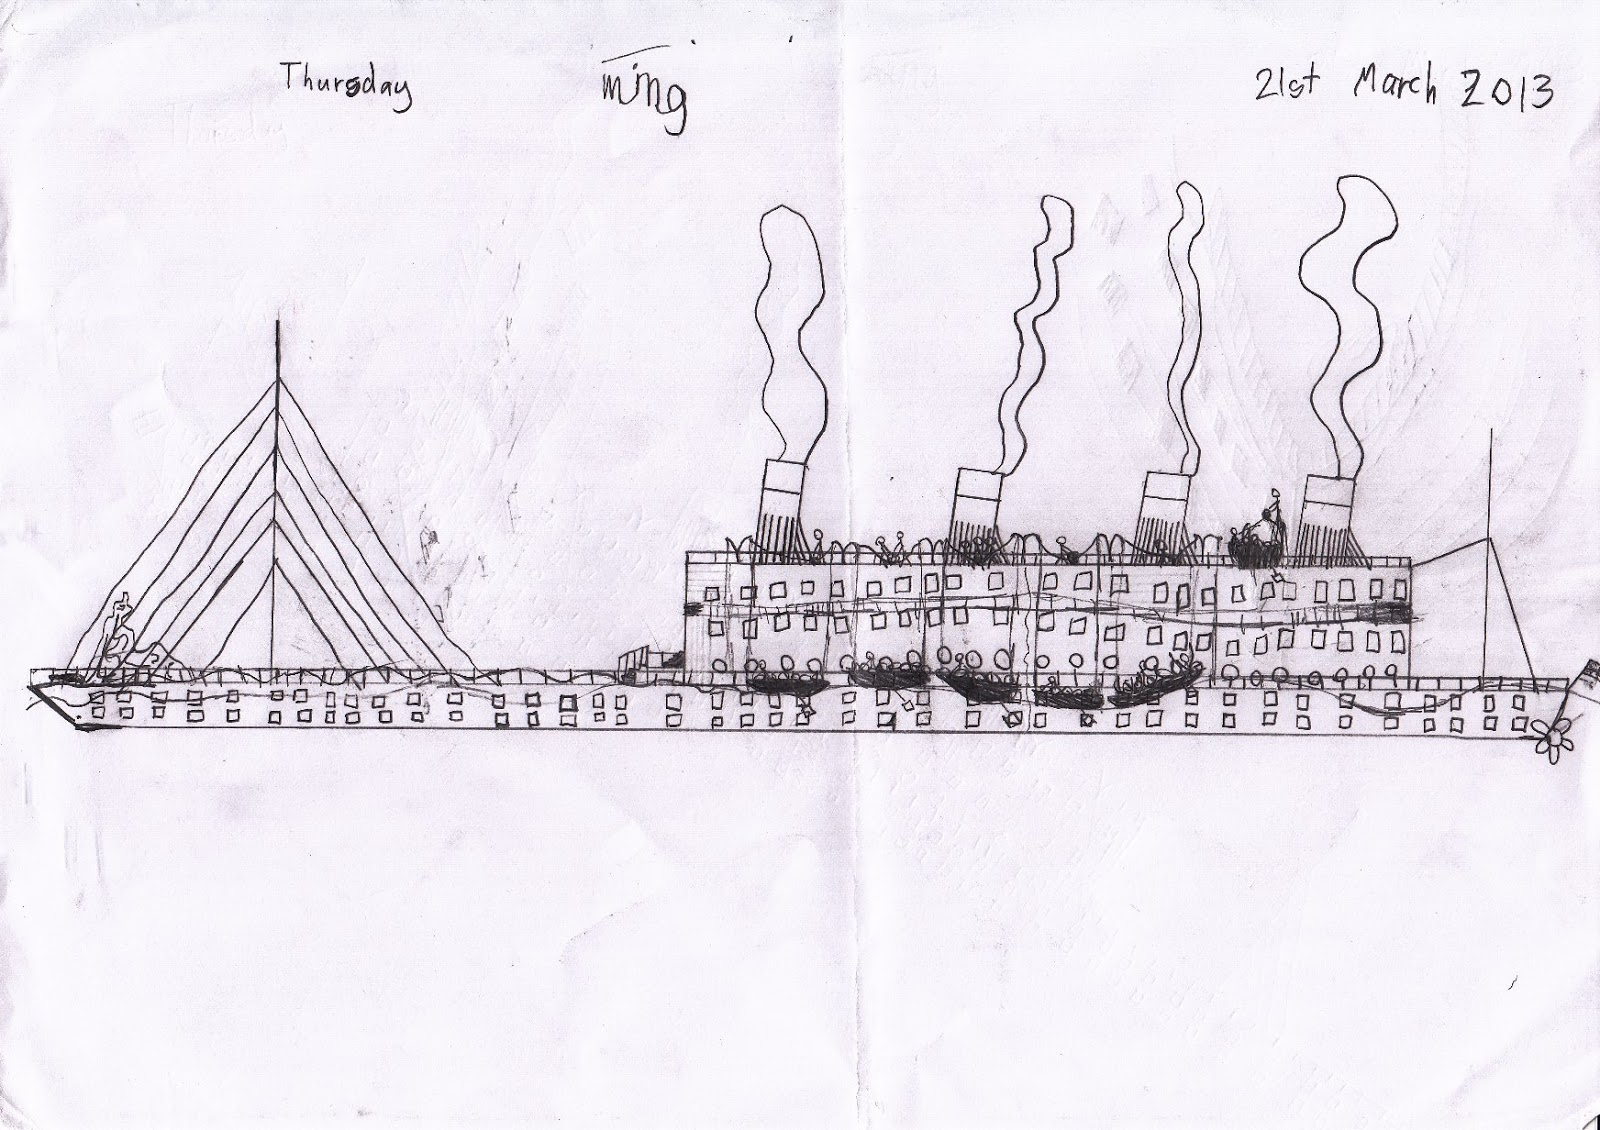 rms titanic 15 apr 2013 [ 1600 x 1130 Pixel ]